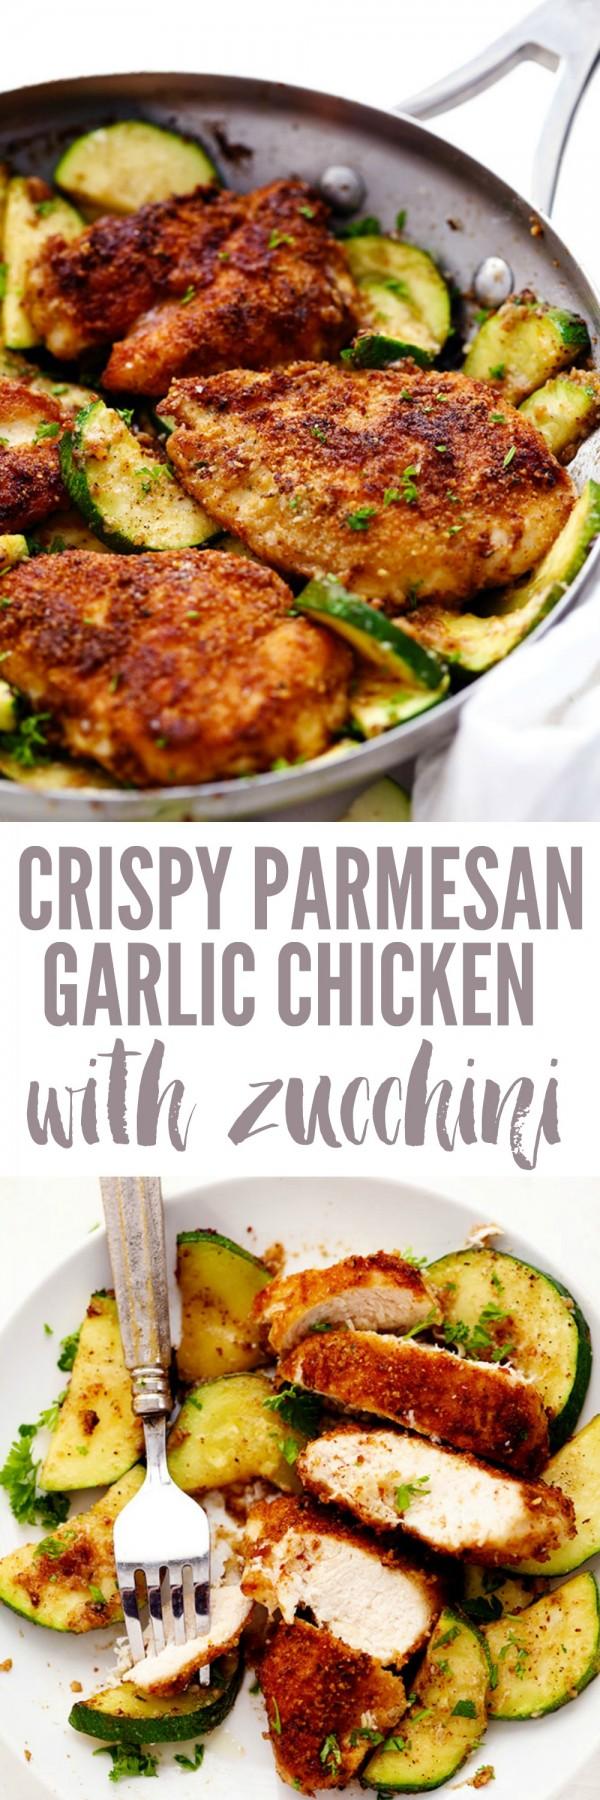 Get the recipe Crispy Parmesan Garlic Chicken with Zucchini @recipes_to_go